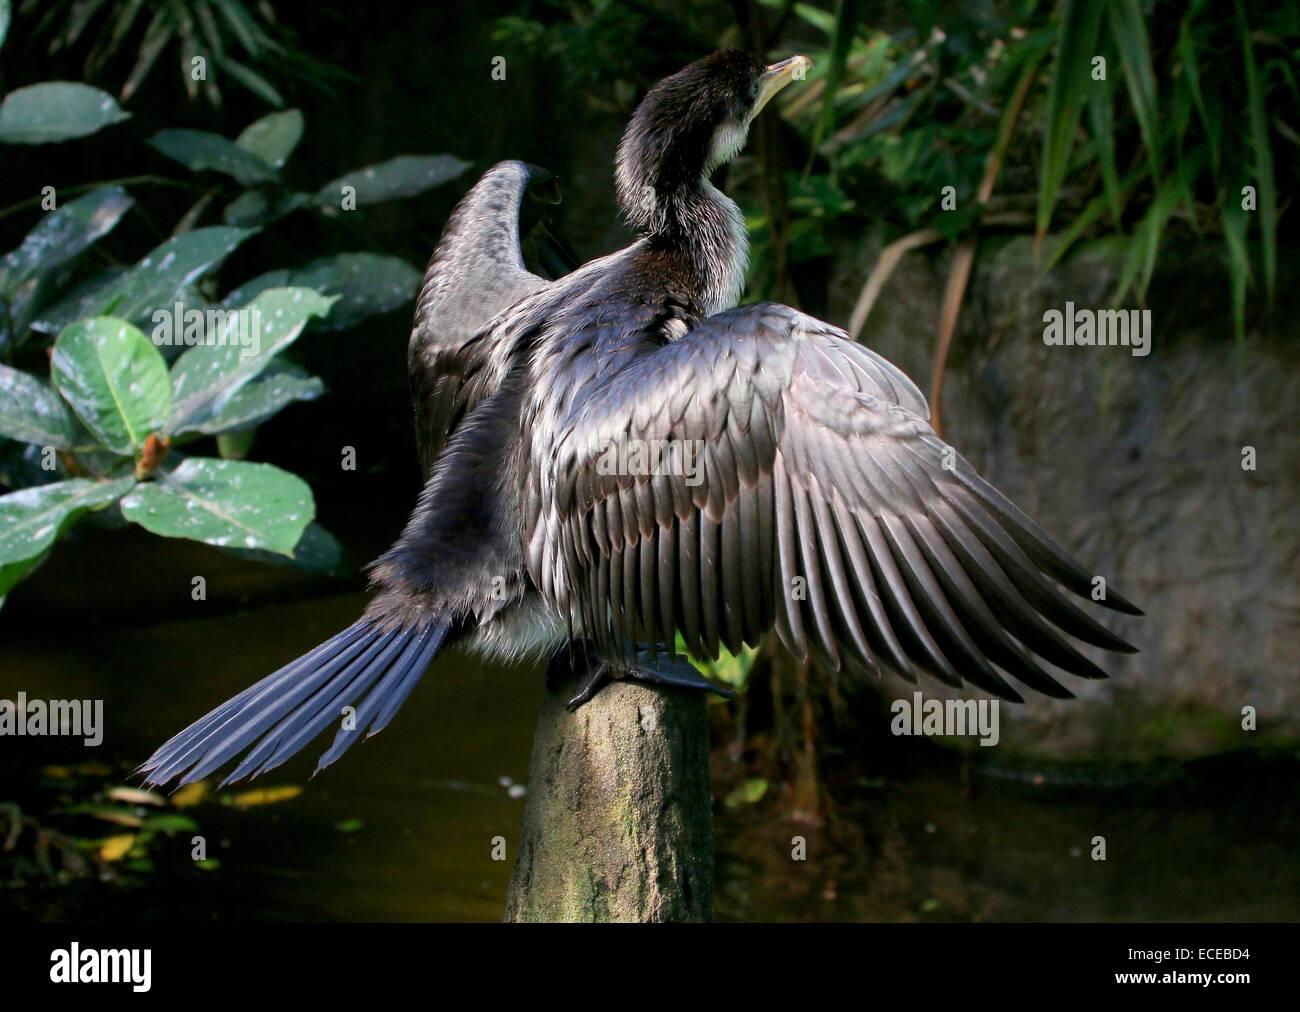 Juvenile Australian Little pied cormorant (Phalacrocorax melanoleucos, Microcarbo melanoleucos) drying feathers - Stock Image